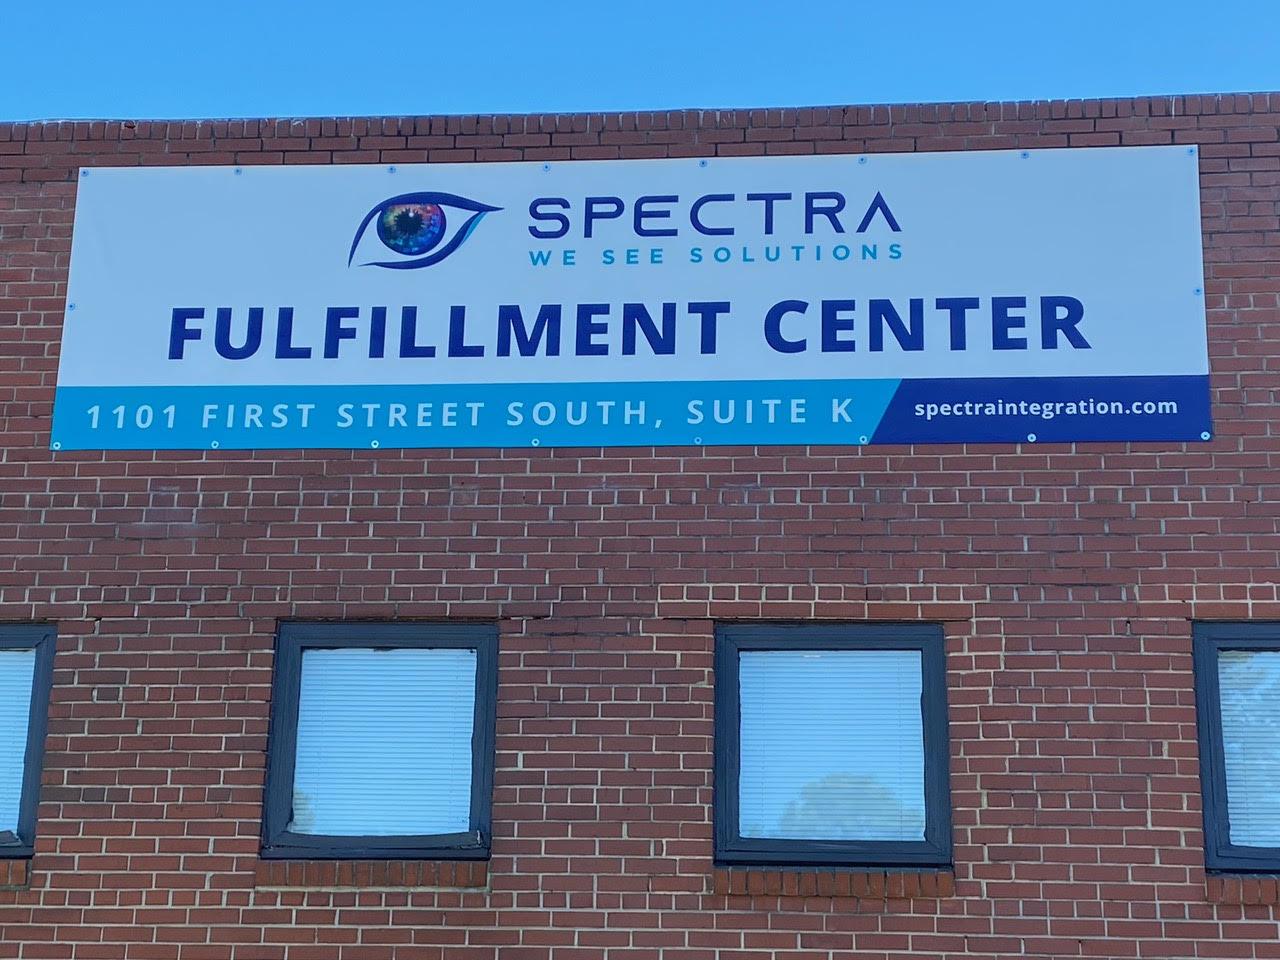 Spectra Fulfillment Center